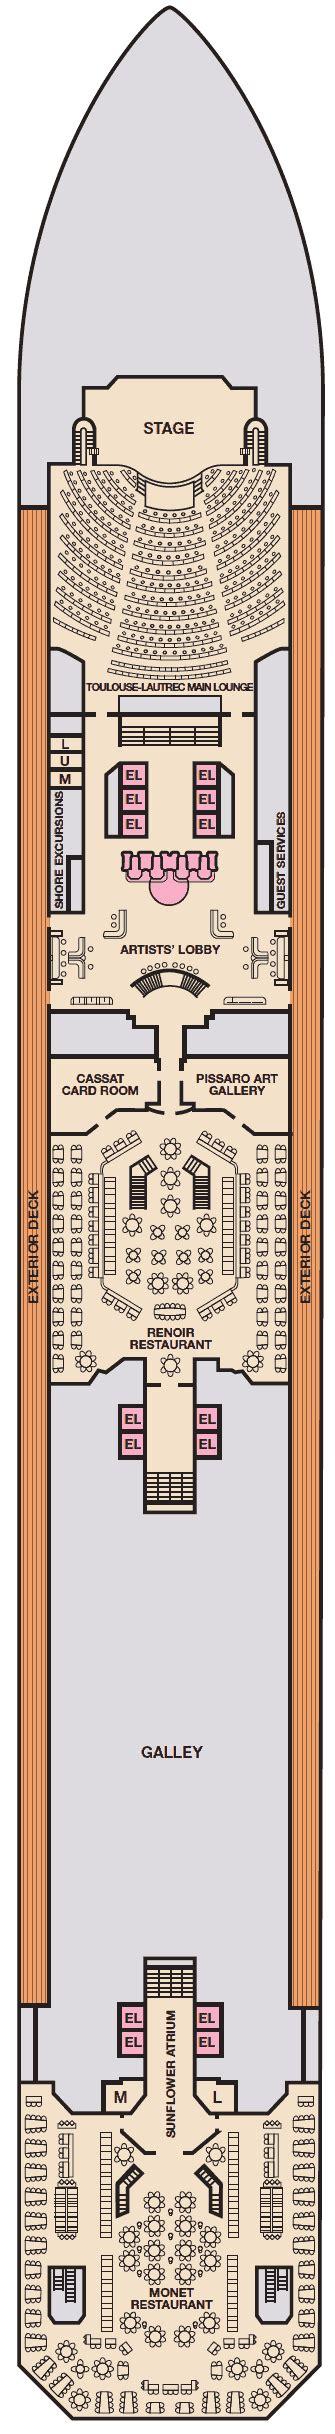 carnival conquest floor plan carnival conquest deck plans